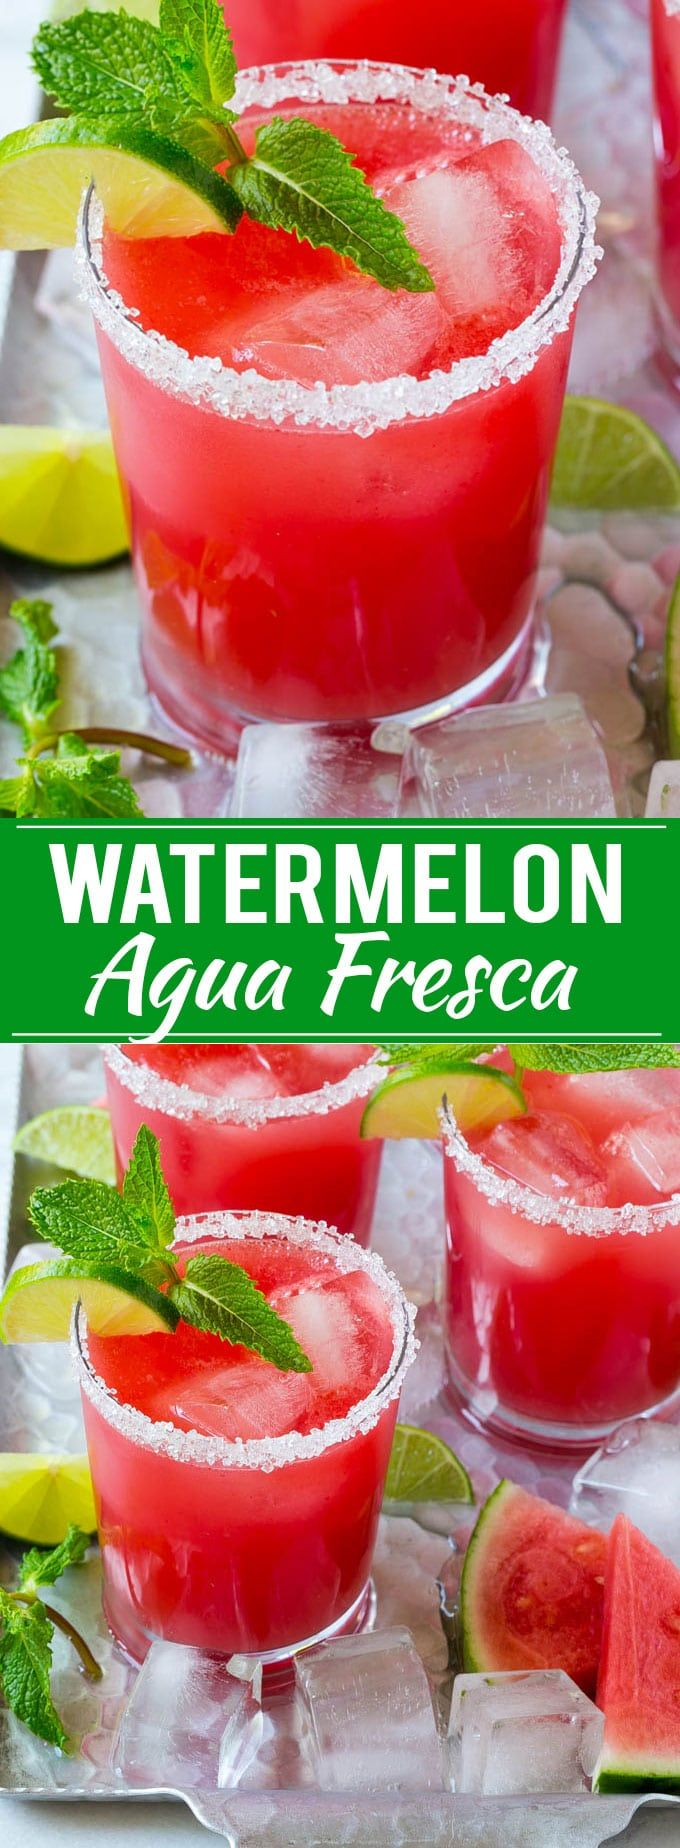 Watermelon Agua Fresca | Watermelon Drink | Agua Fresca Recipe